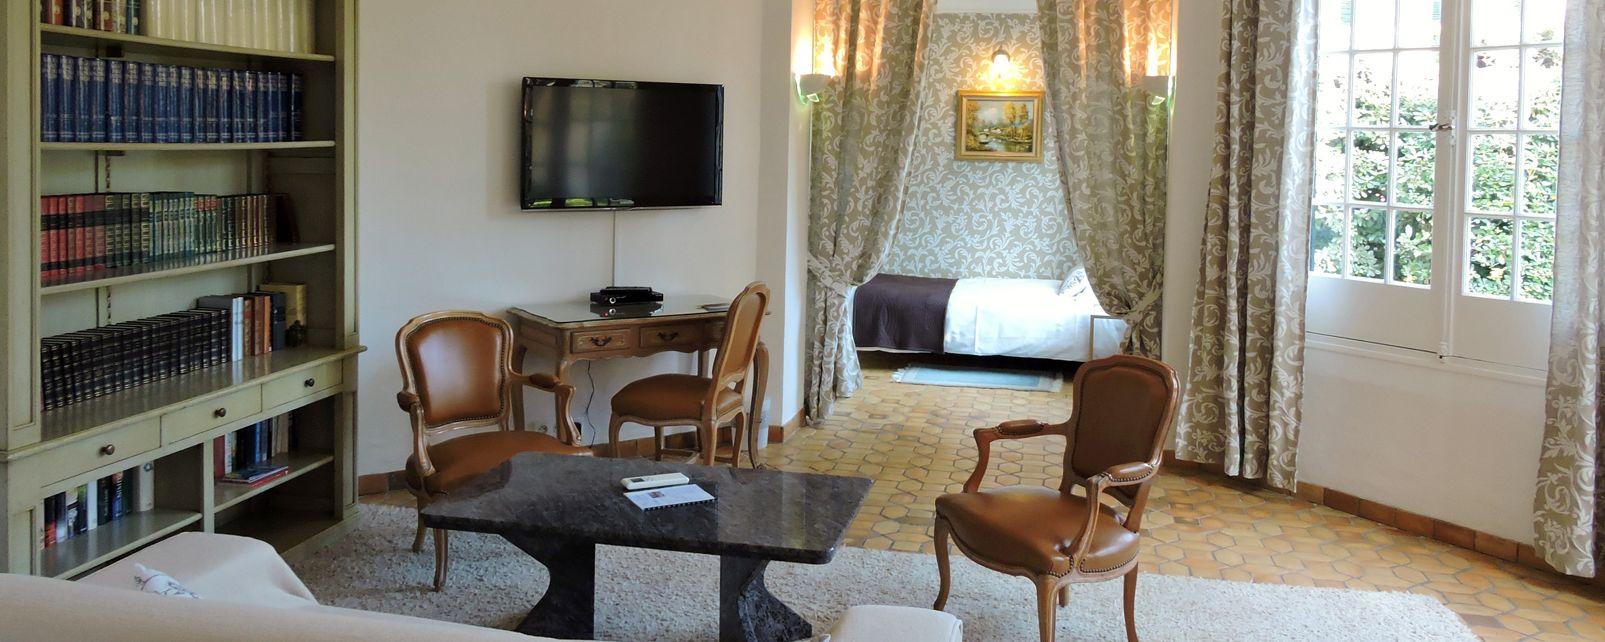 Hotel Mas Djoliba